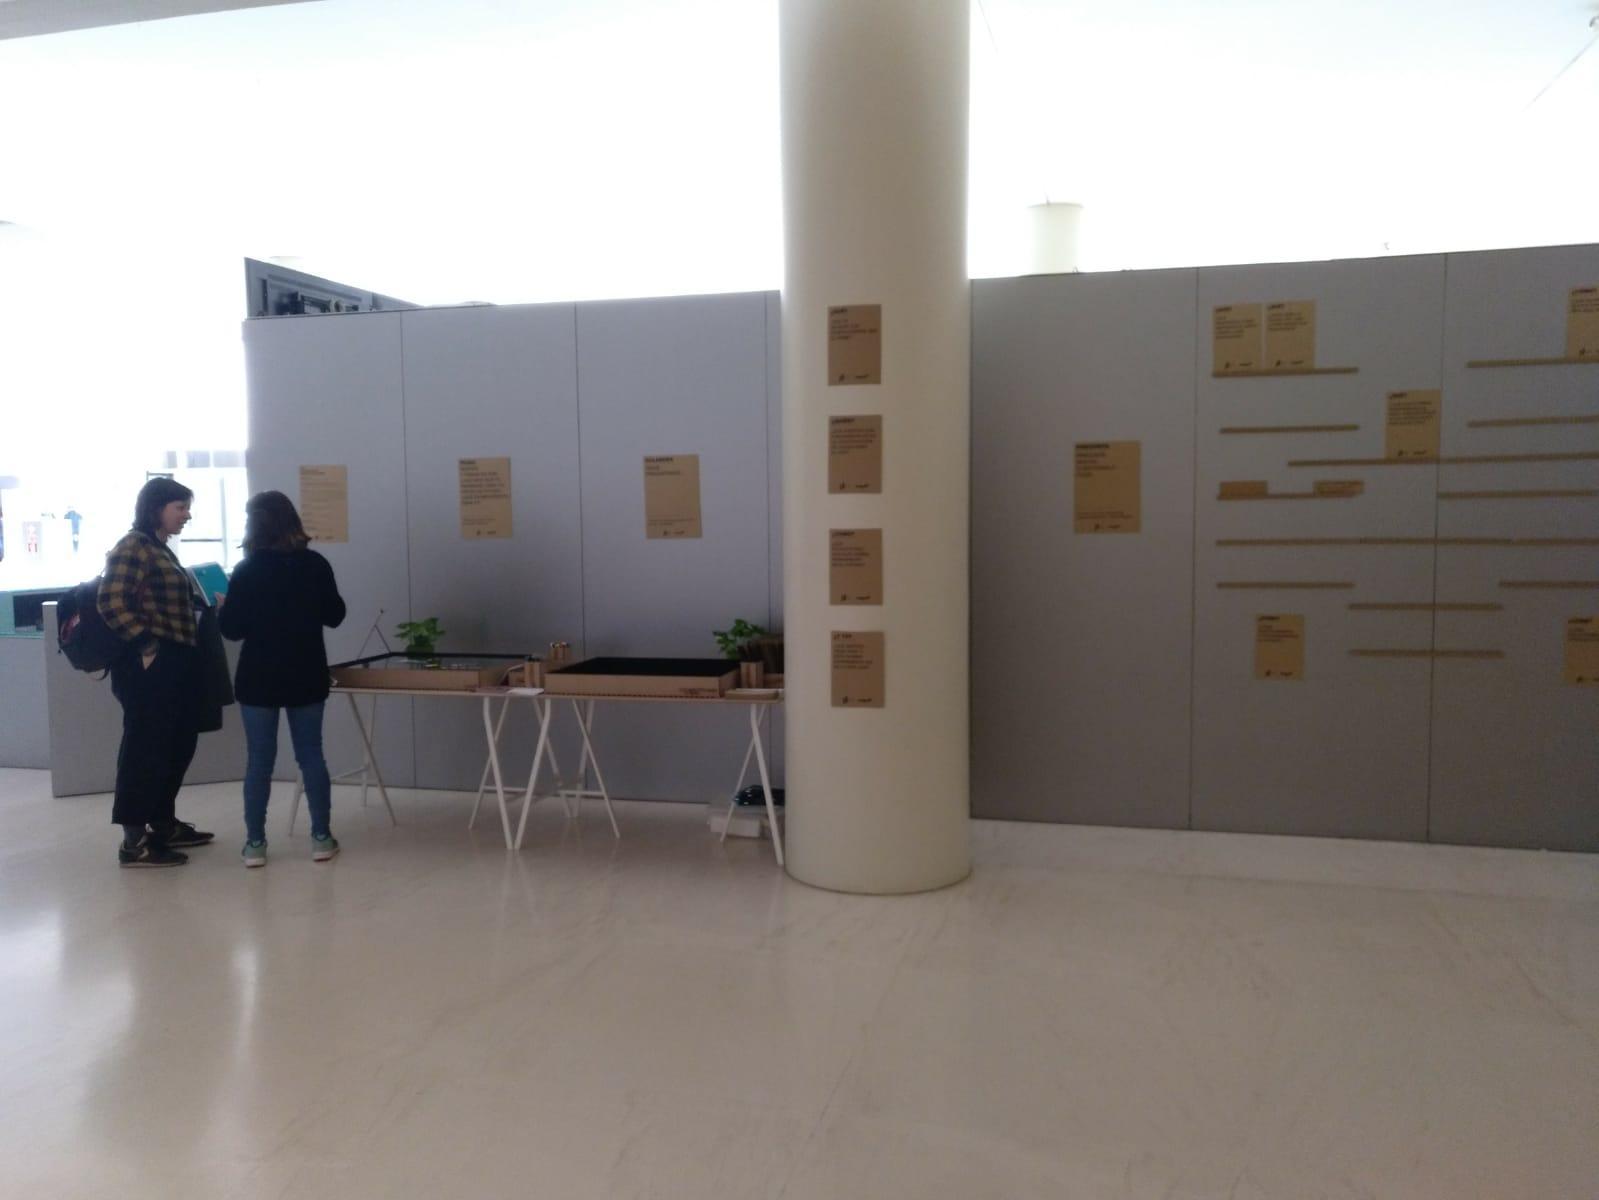 Vista general de l'espai al CaixaForum